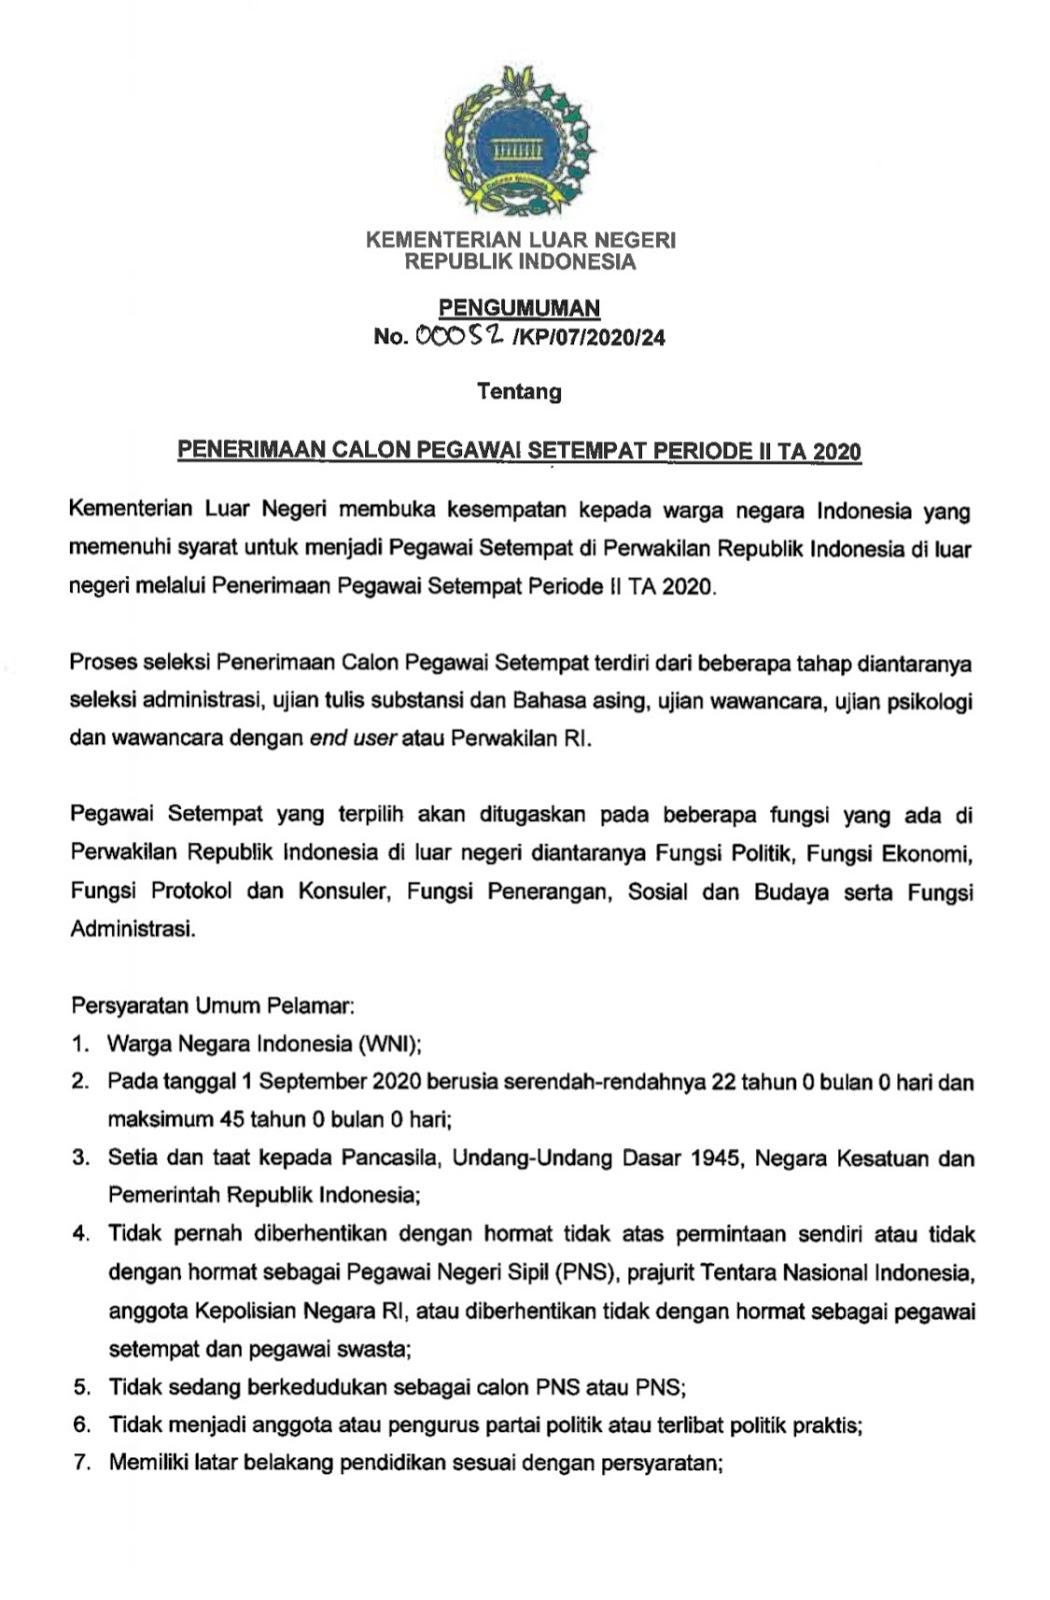 Lowongan Kerja Pegawai Setempat Kementerian Luar Negeri Republik Indonesia Agustus 2020